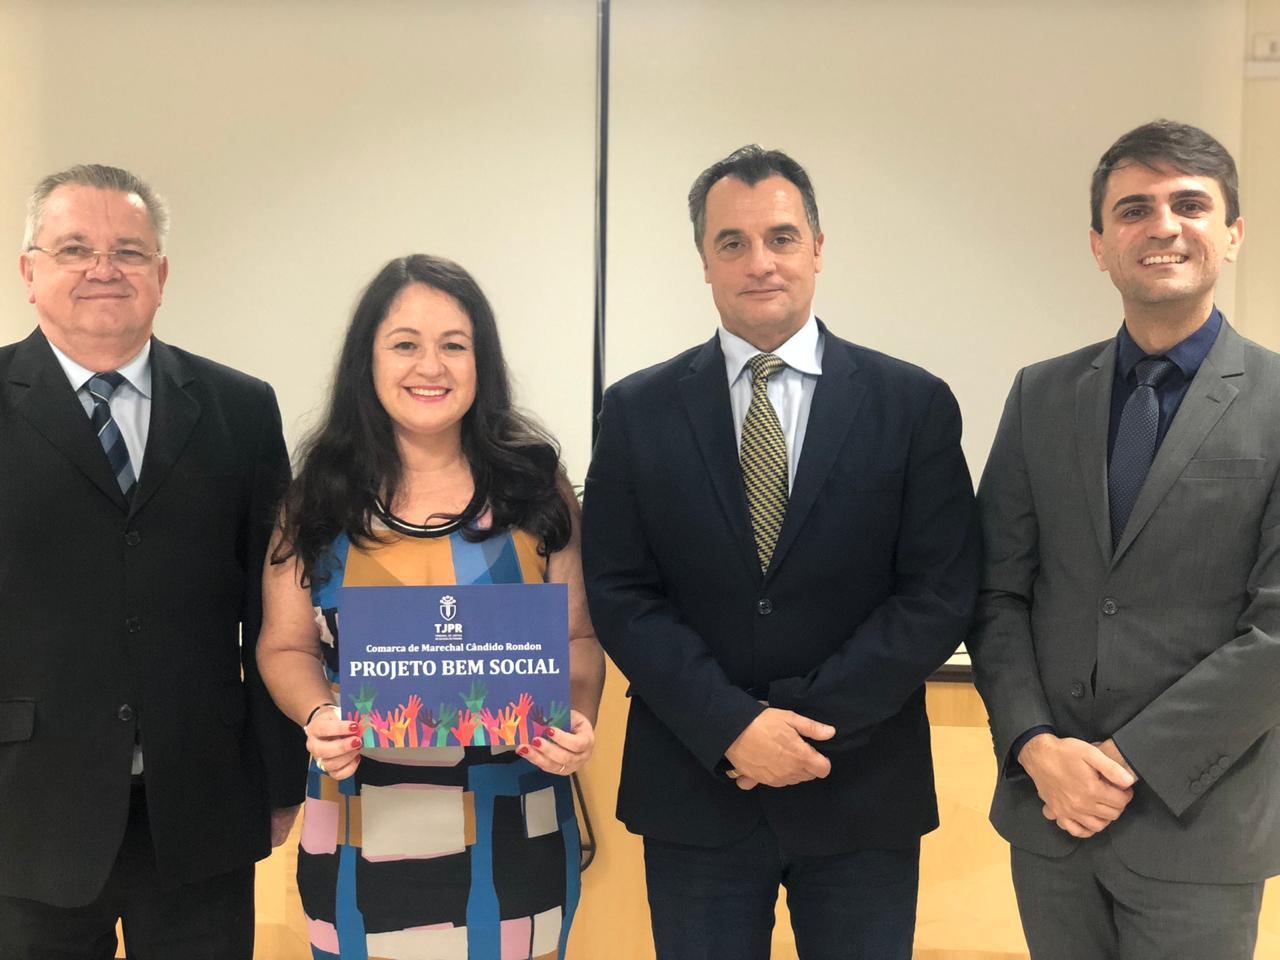 Juíza Berenice Nassar apresenta o projeto Bem Social em Marechal Cândido Rondon